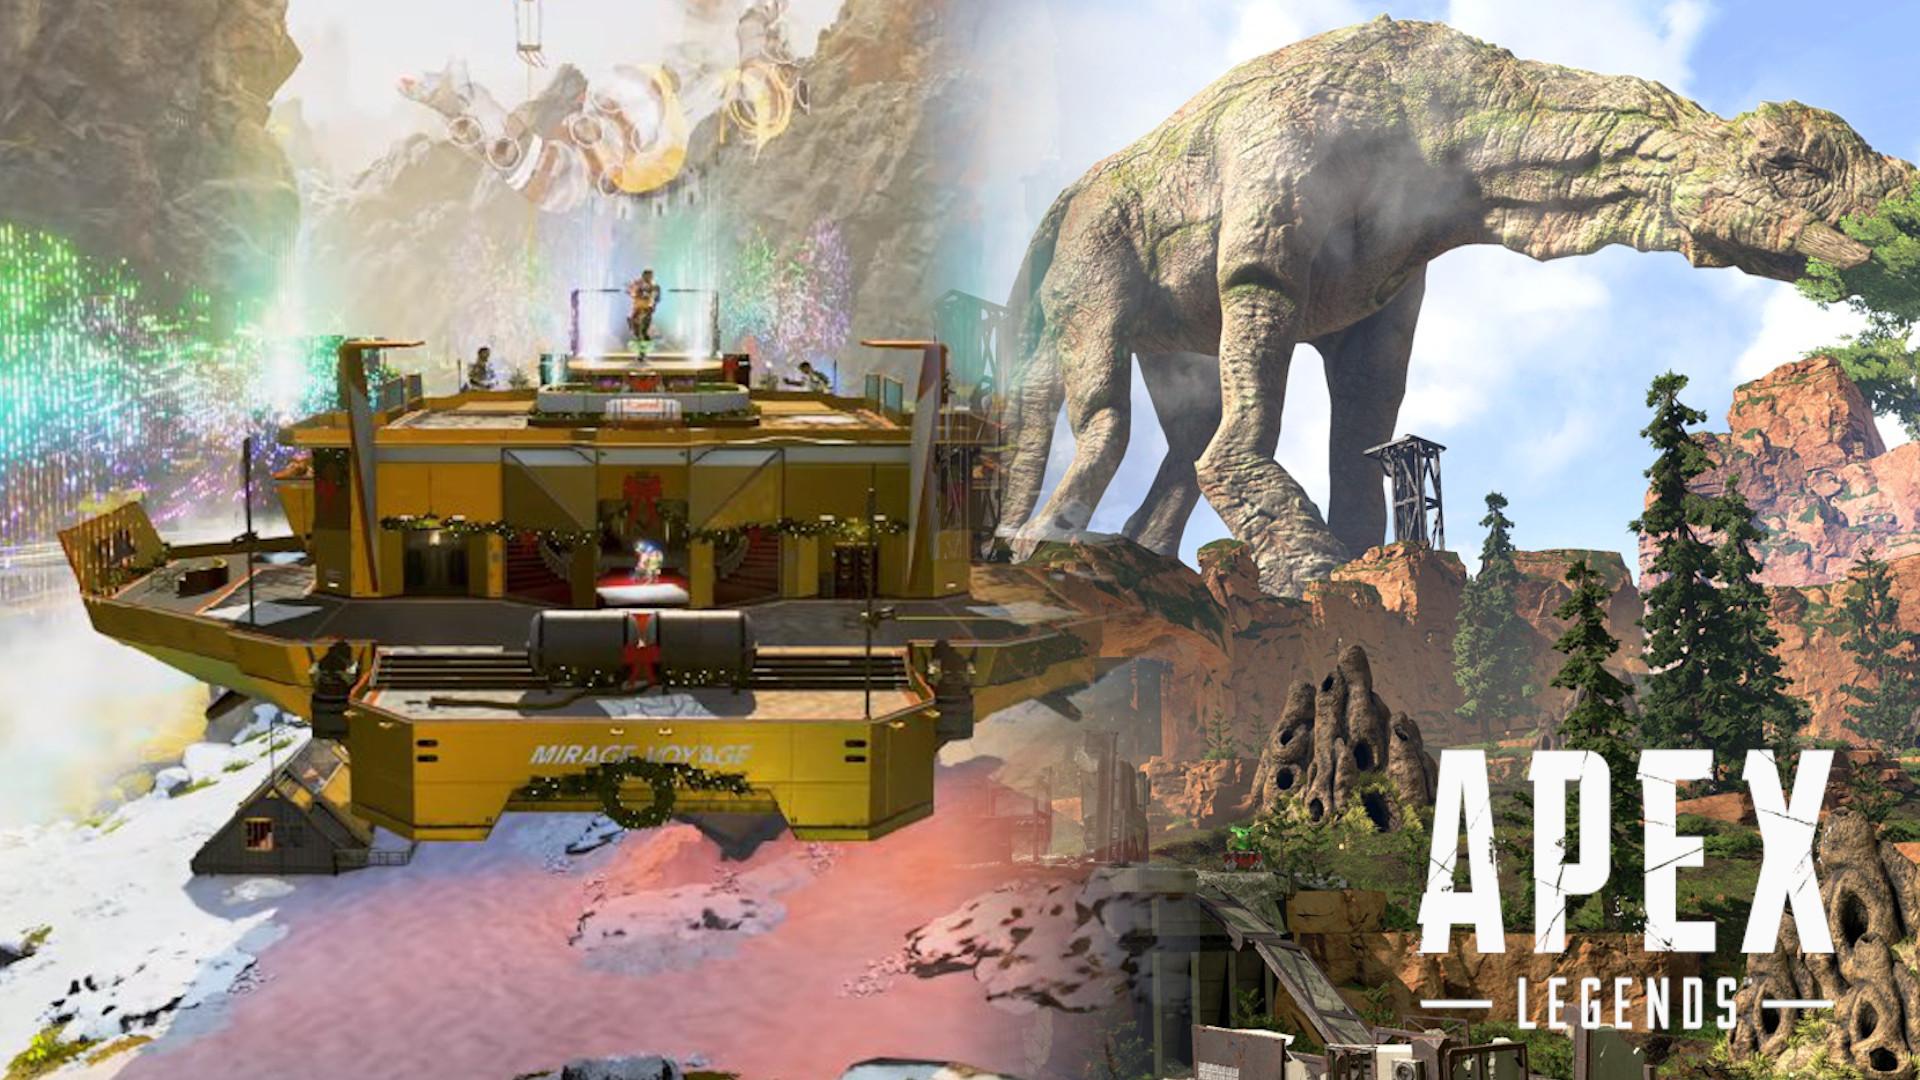 apex legends mirage voyage kinds canyon